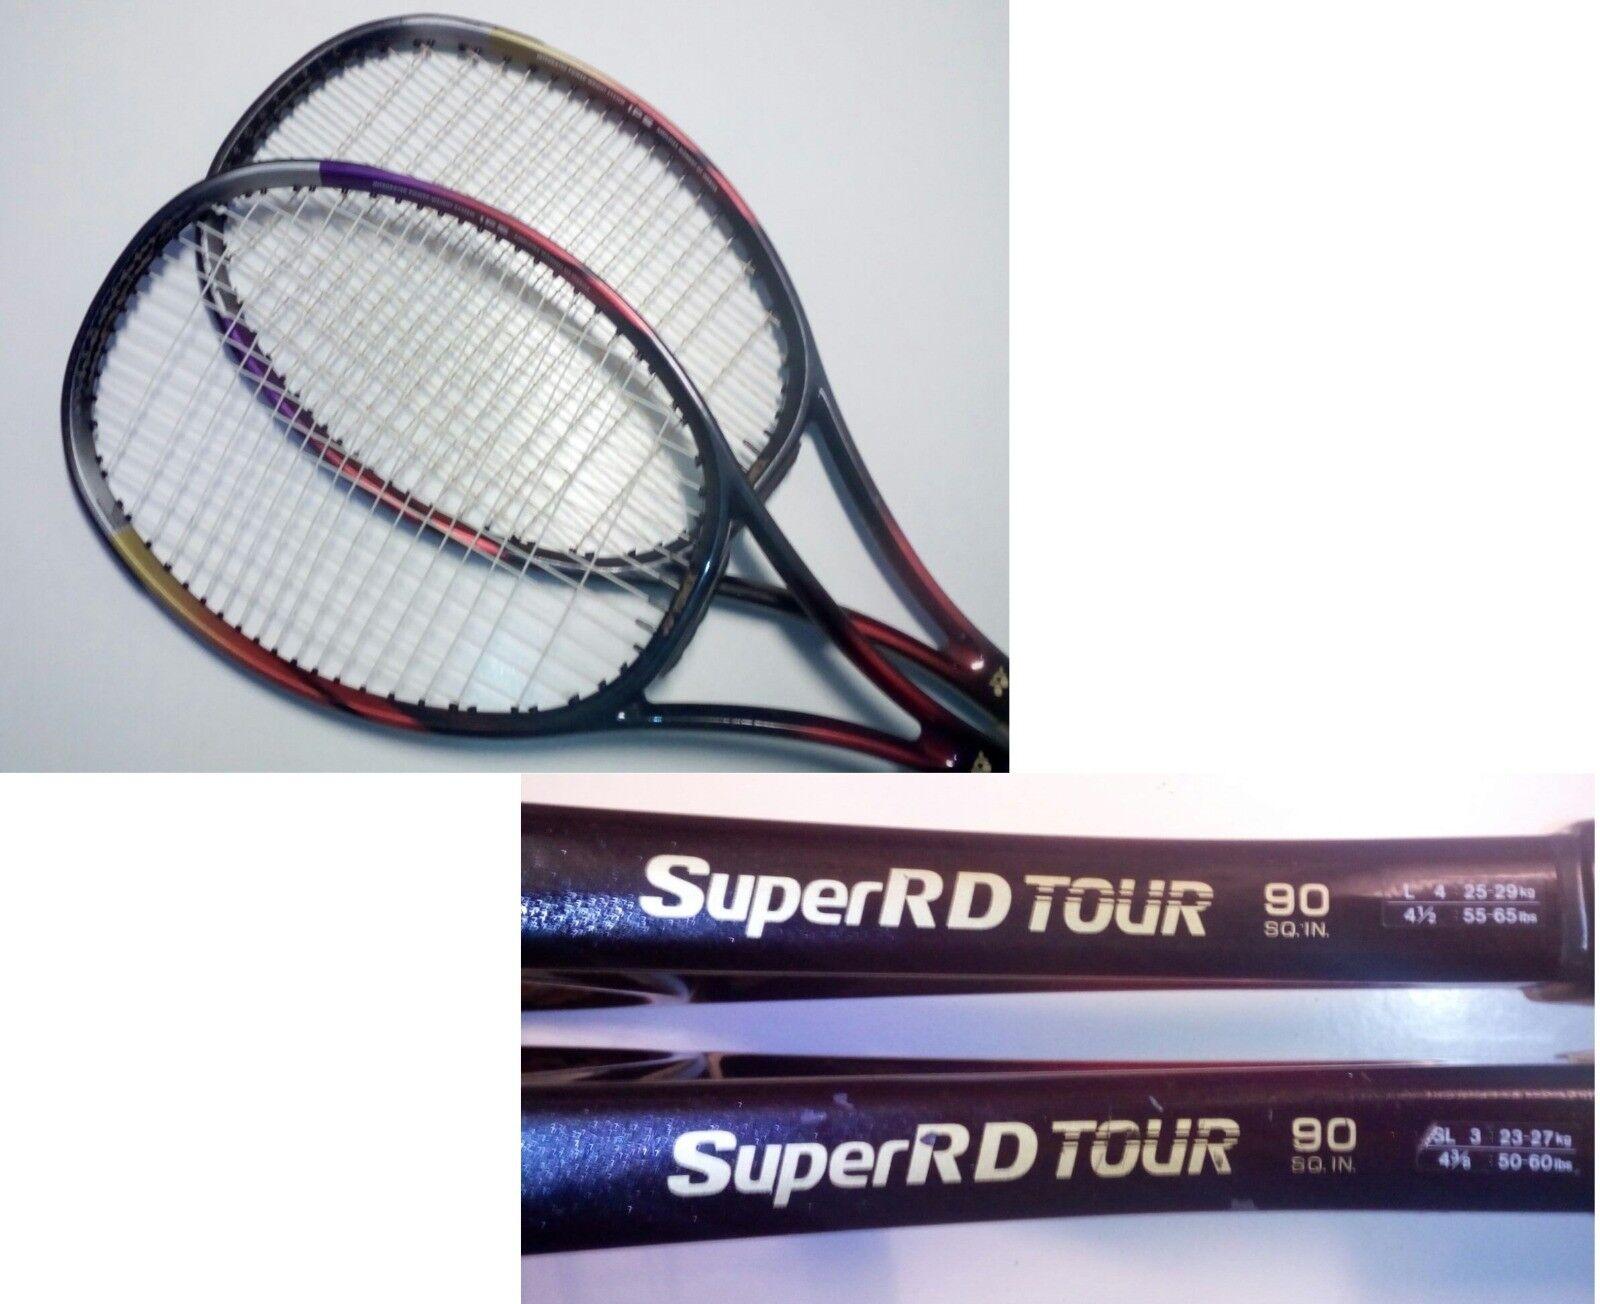 1 x Yonex Super RD Tour 90 * Krajicek Wimbledon 1996 / Hewitt *